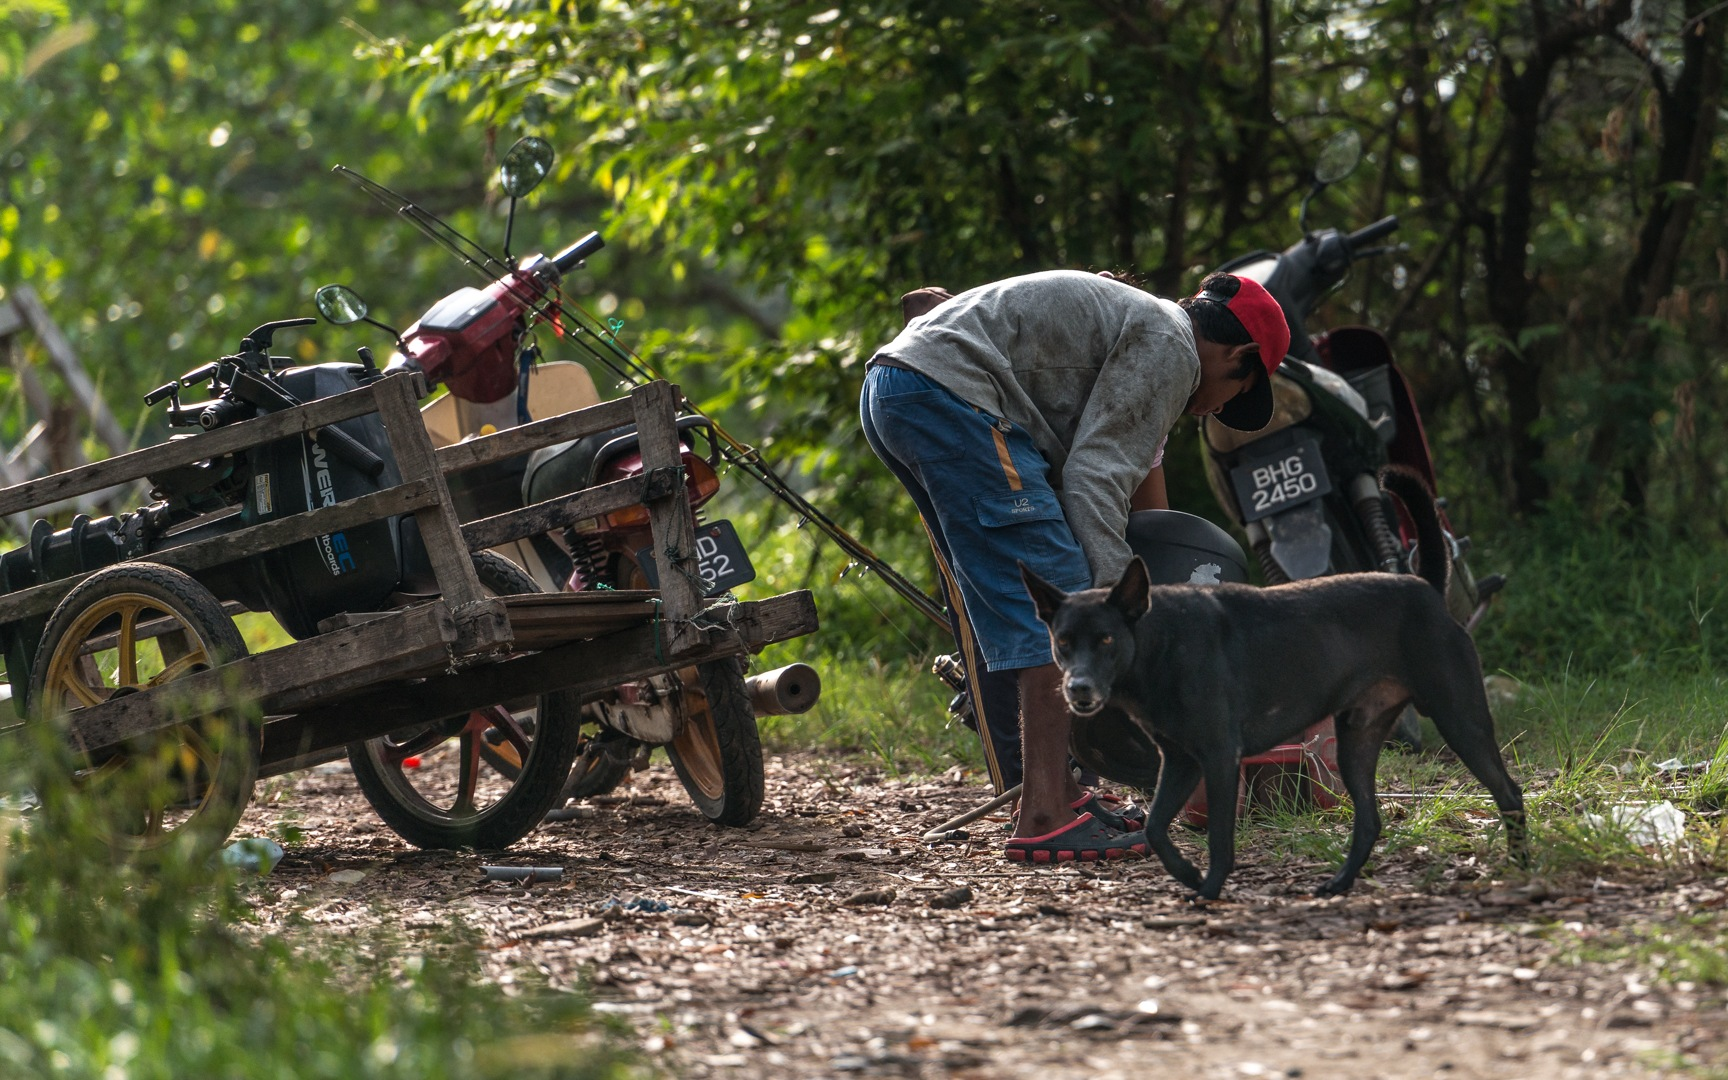 Orang Asli - On The Way To Catch Fish by klchin66